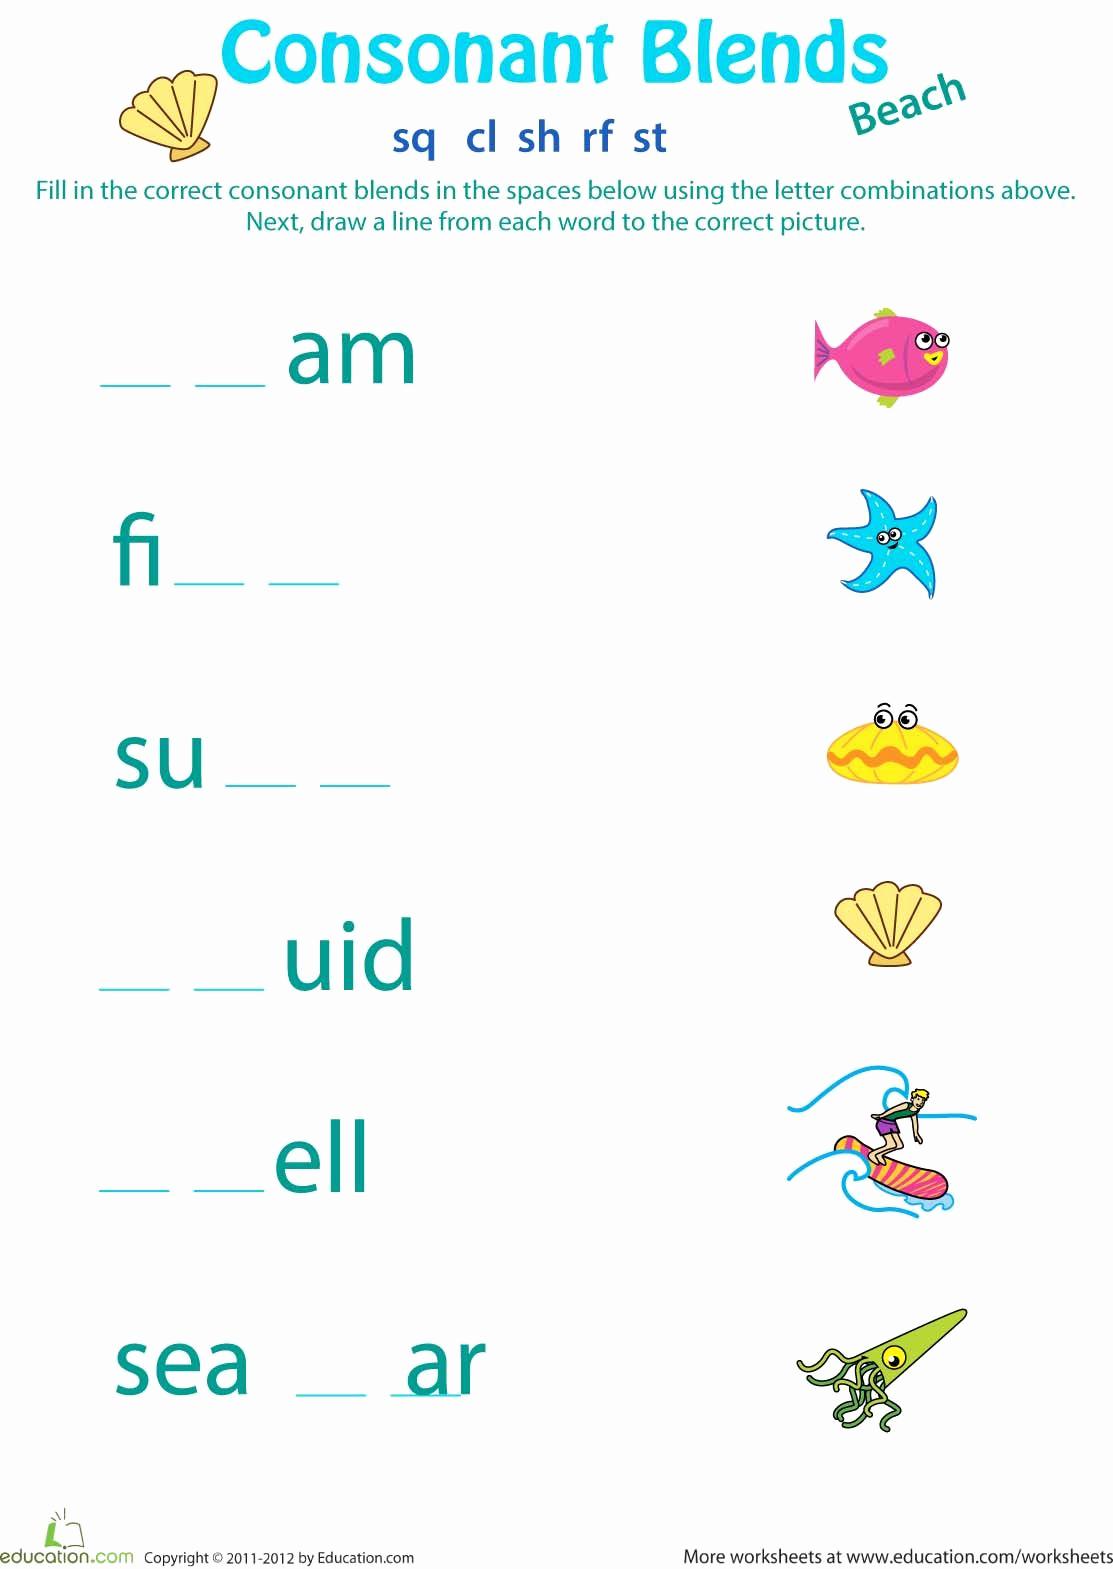 Blends Worksheet for First Grade Inspirational 1st Grade Spelling Image by Jc Castilla